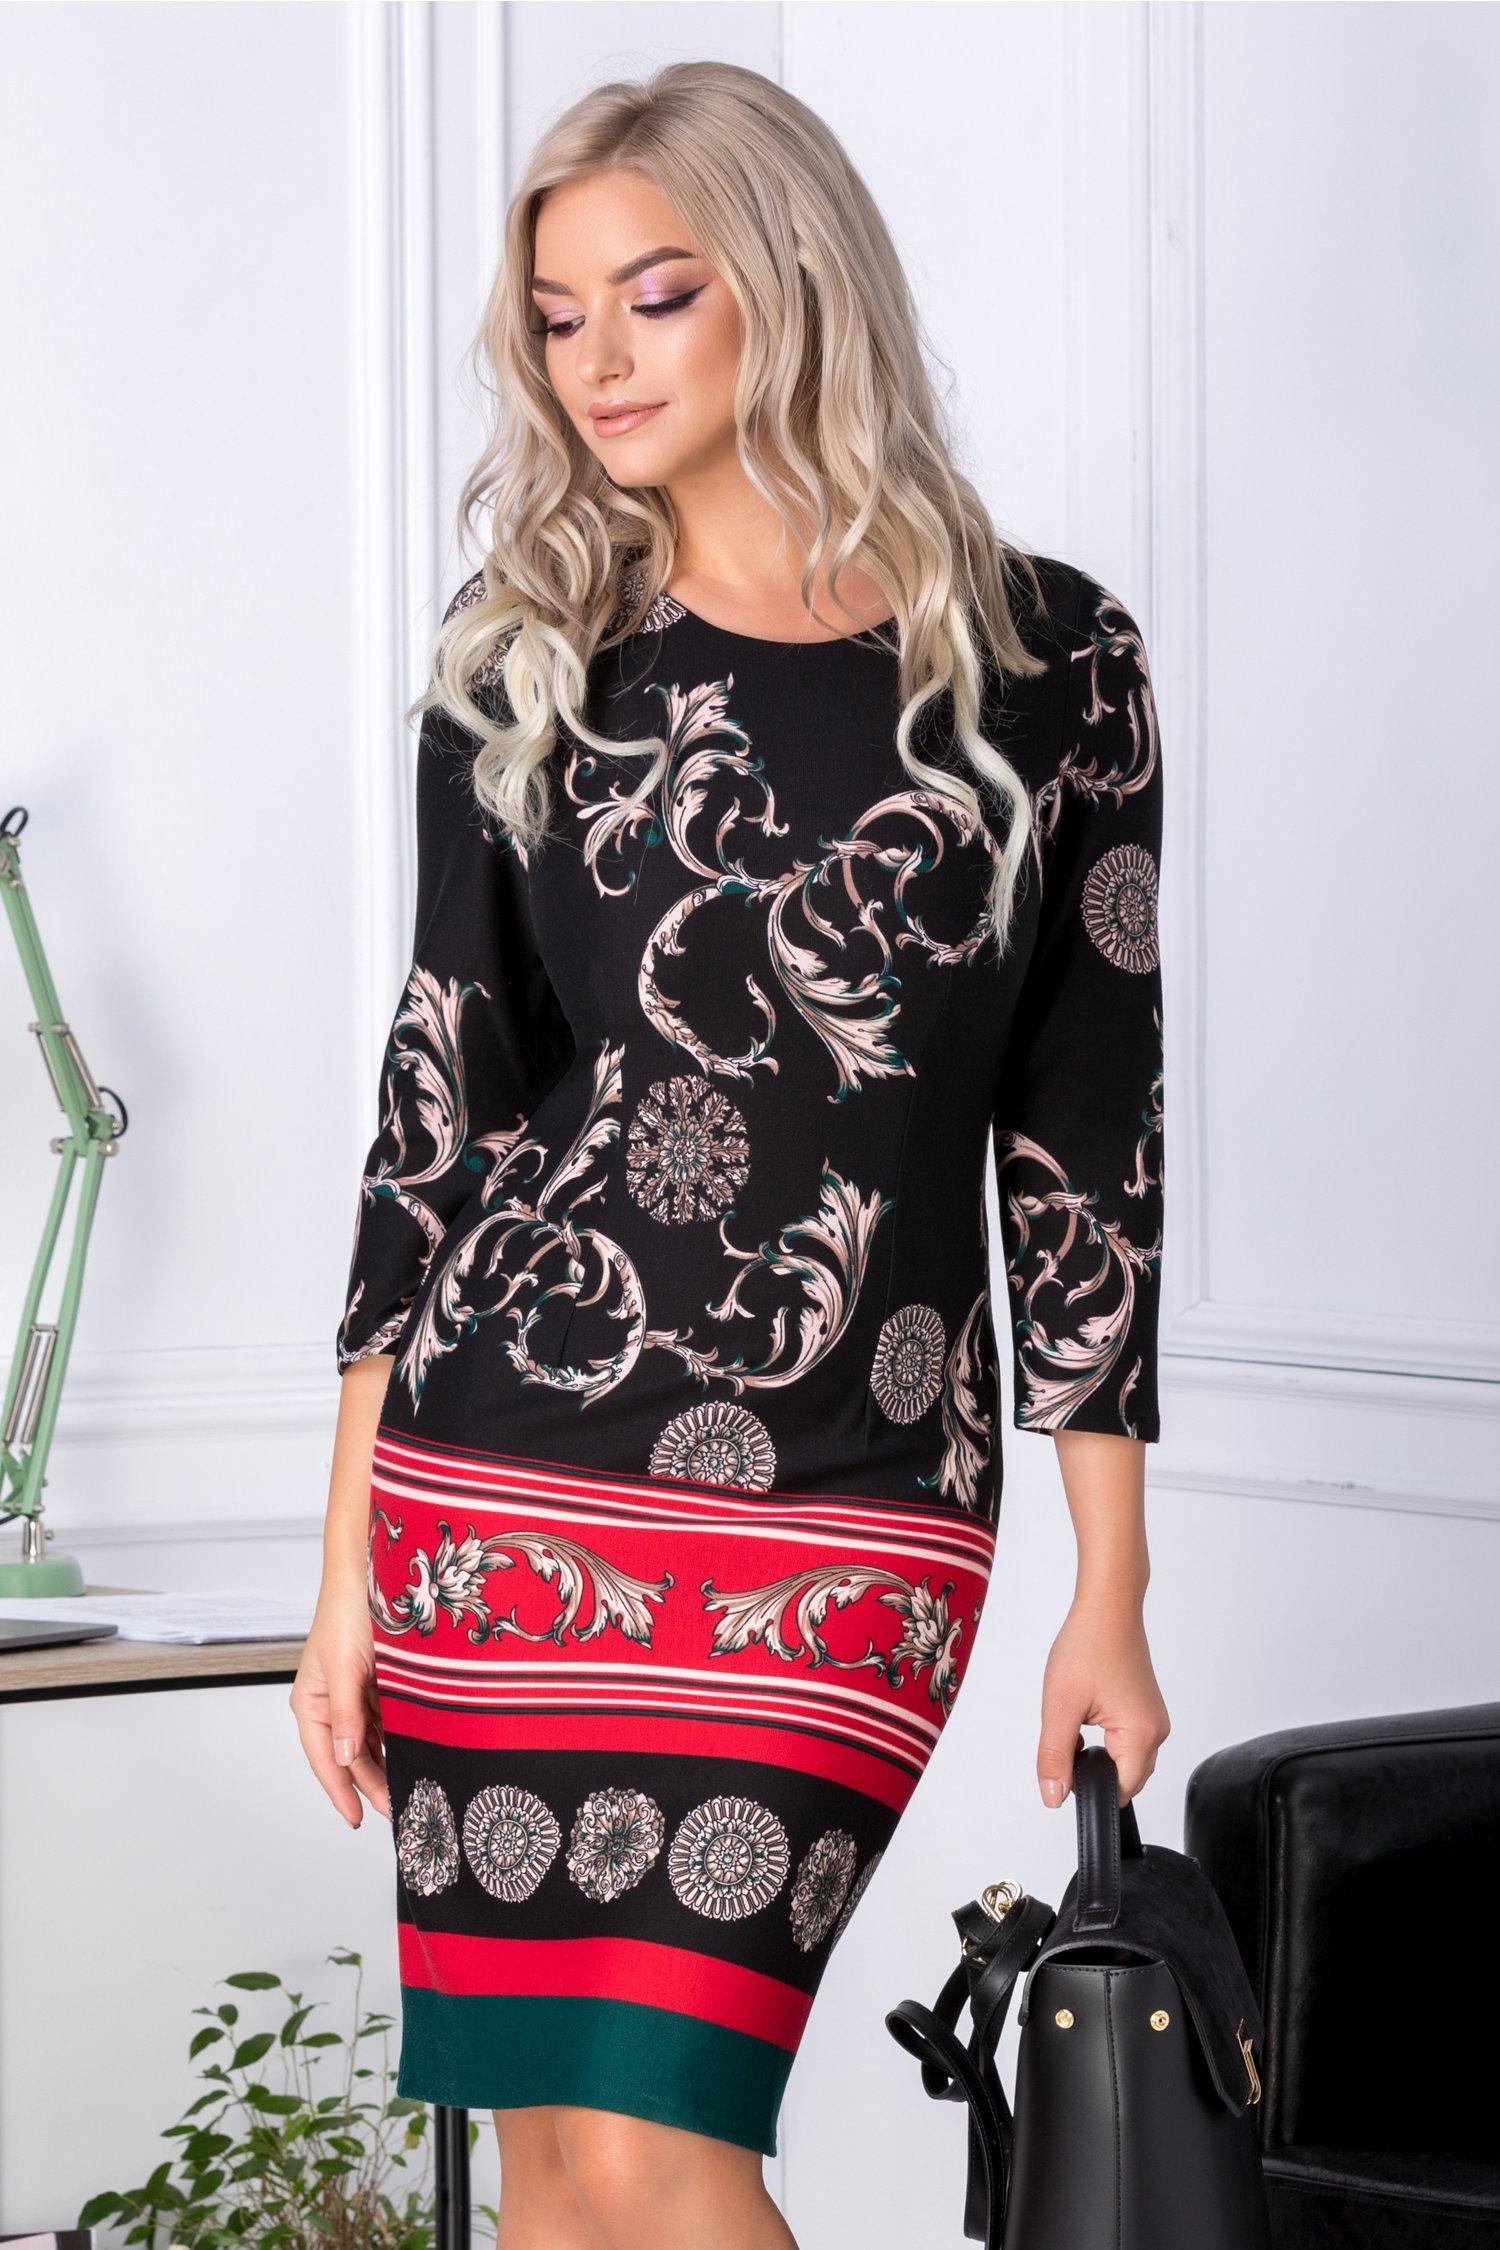 Rochie Tami neagra cu motive florale bej